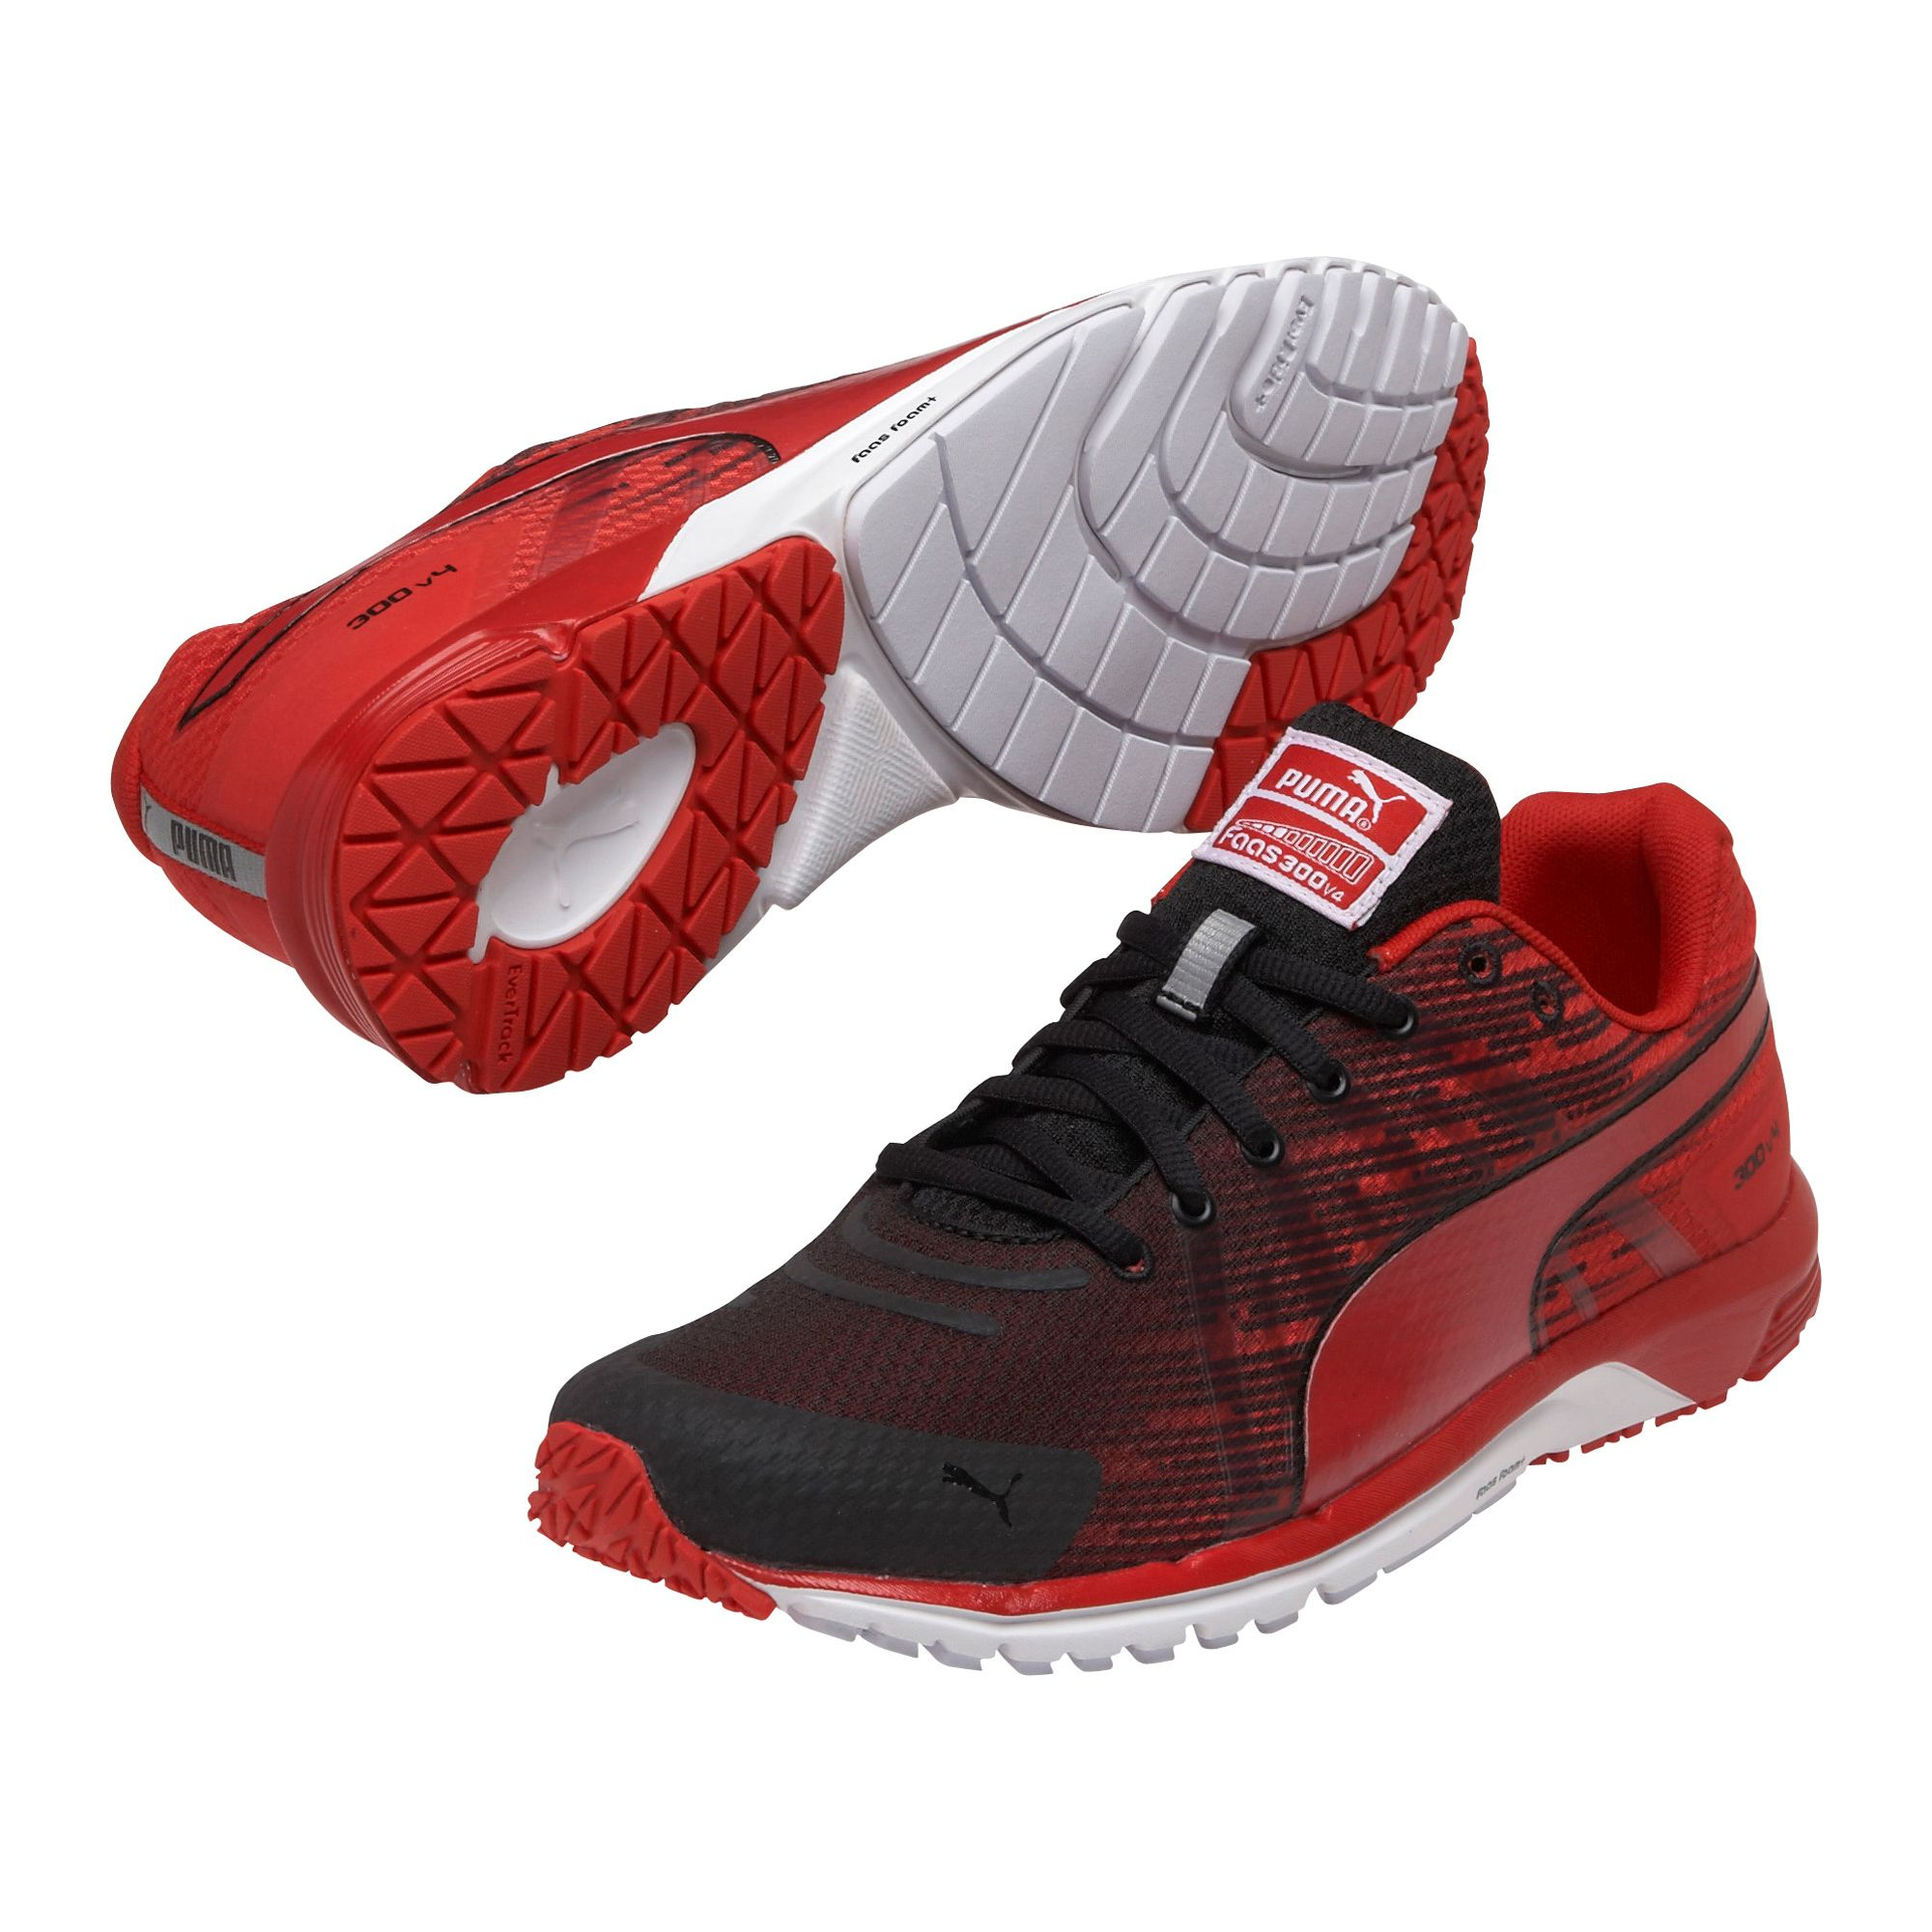 Adidas Alphabounce Purple Running Shoes - Buy Adidas